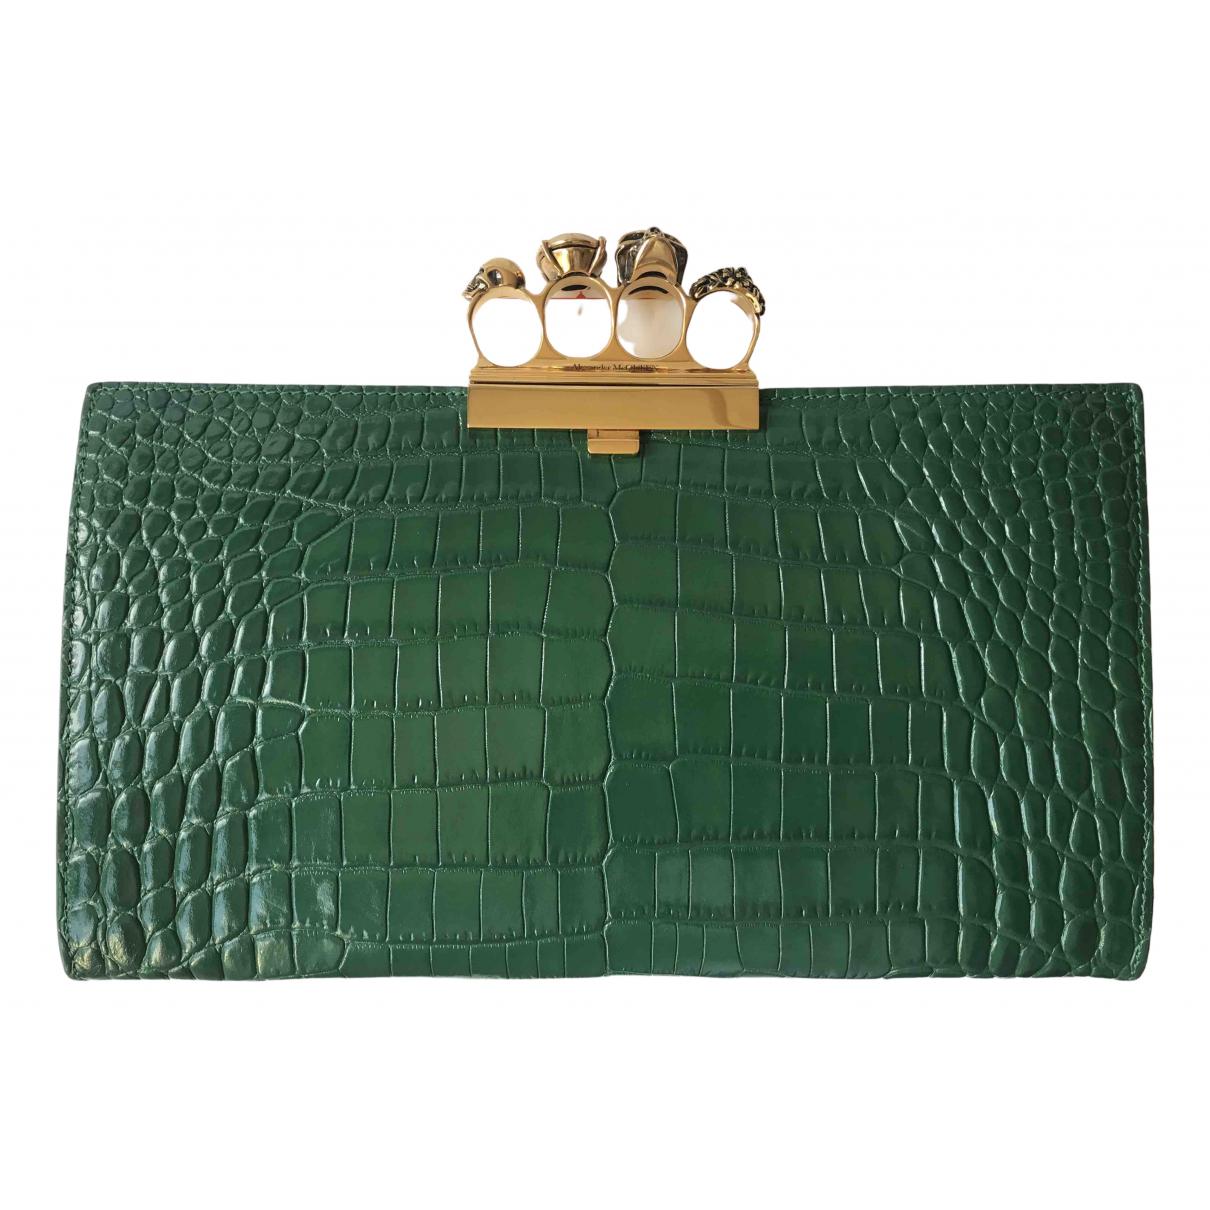 Alexander Mcqueen Knuckle Green Leather Clutch bag for Women \N